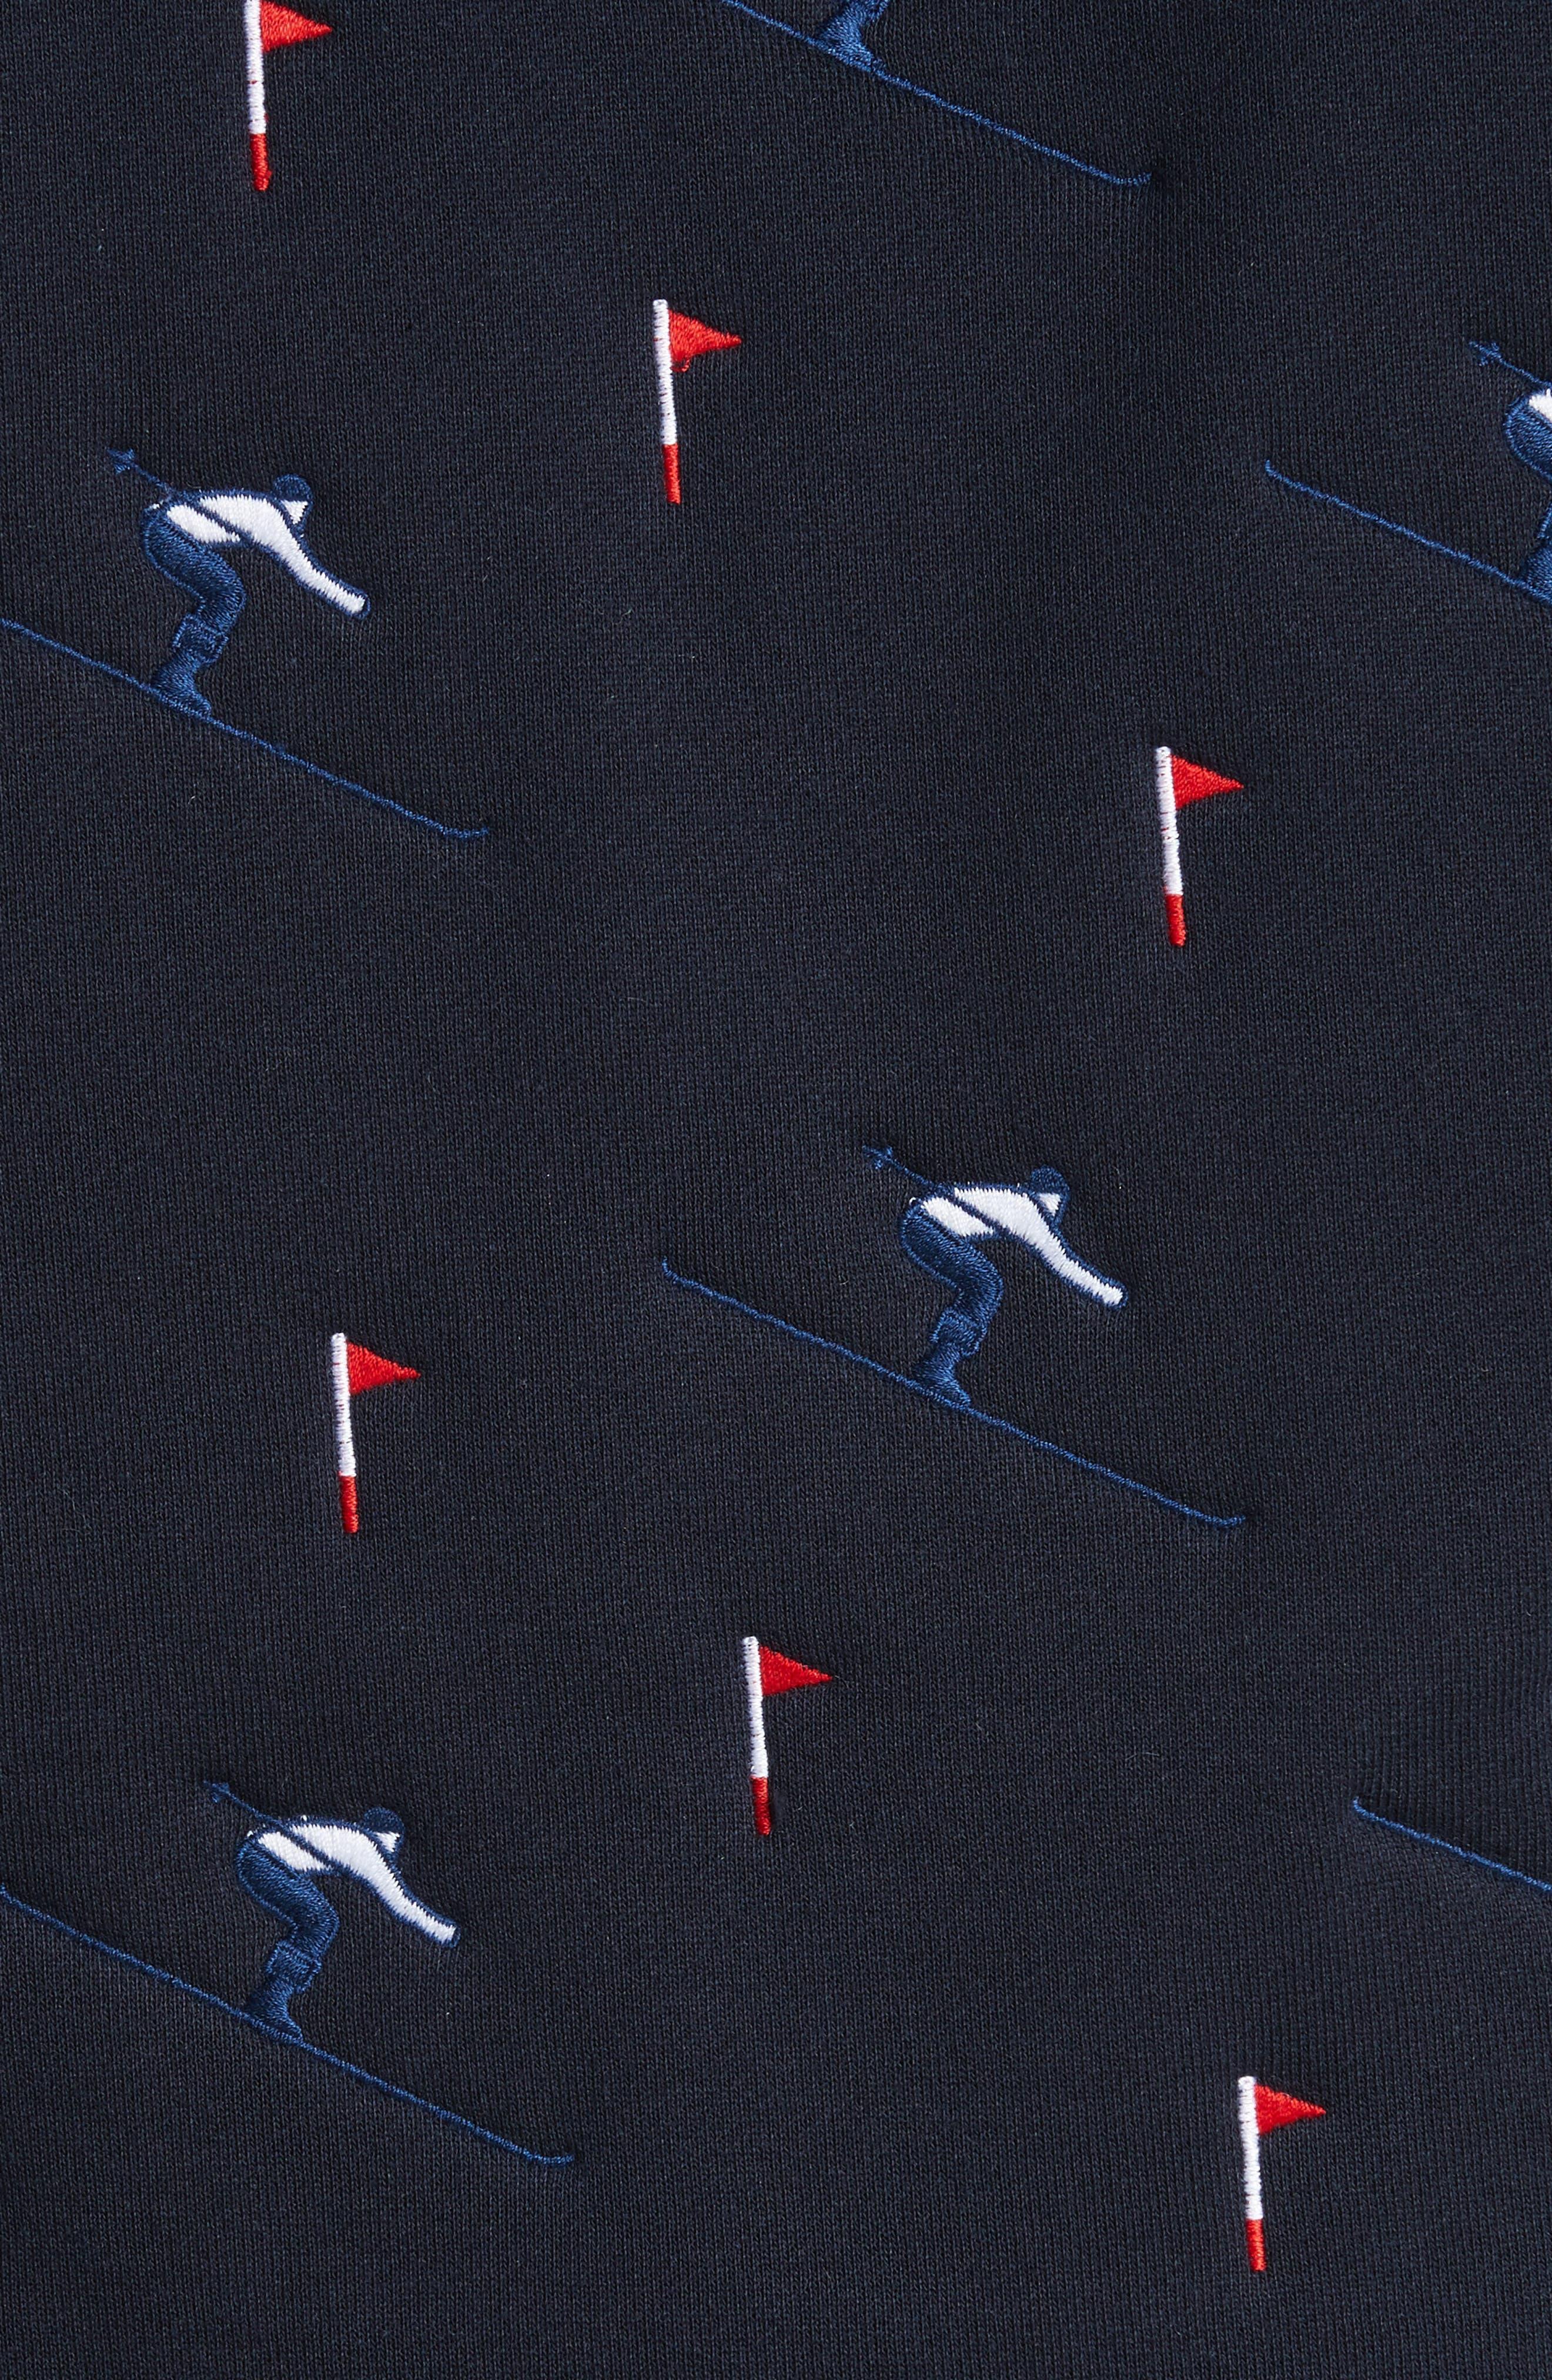 Embroidered Skier Zip Hoodie,                             Alternate thumbnail 5, color,                             Navy